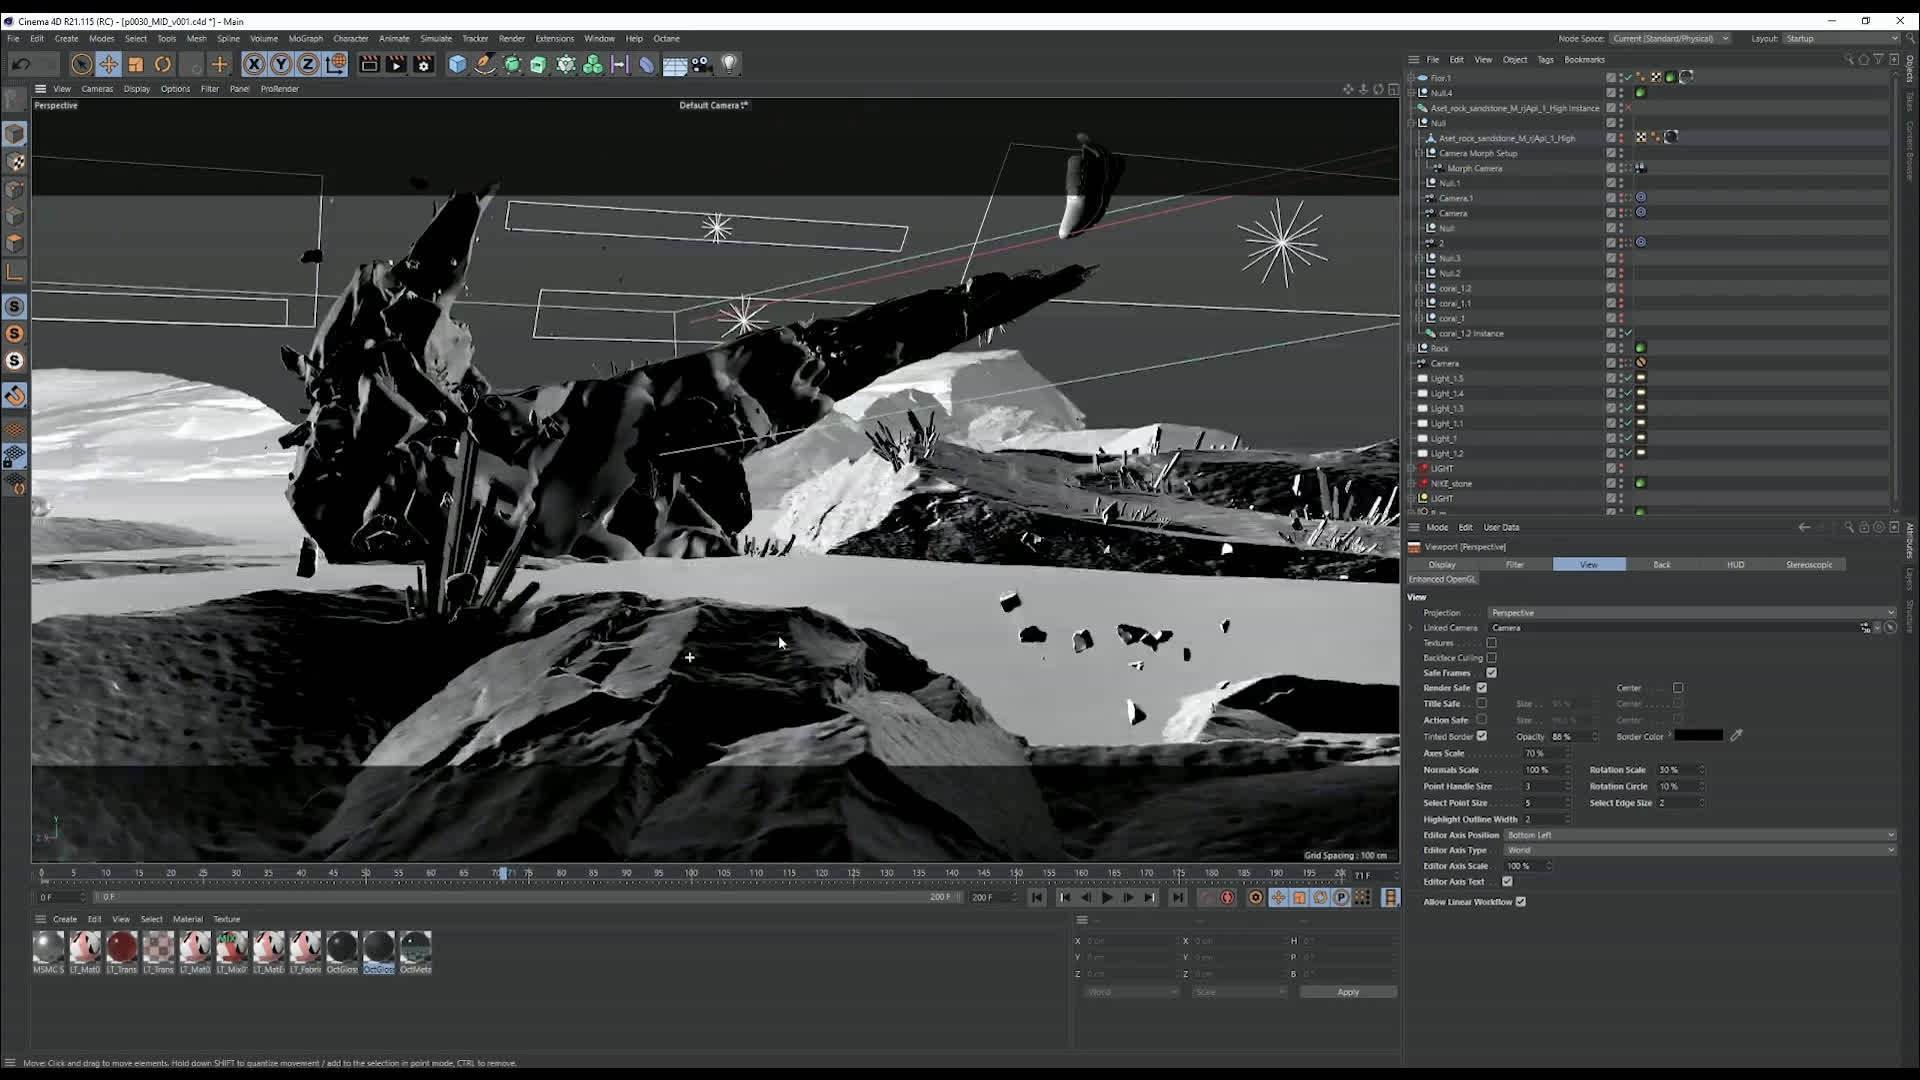 Mondlicht Studio给Nike Air Max制作的两条宣传片和幕后花絮